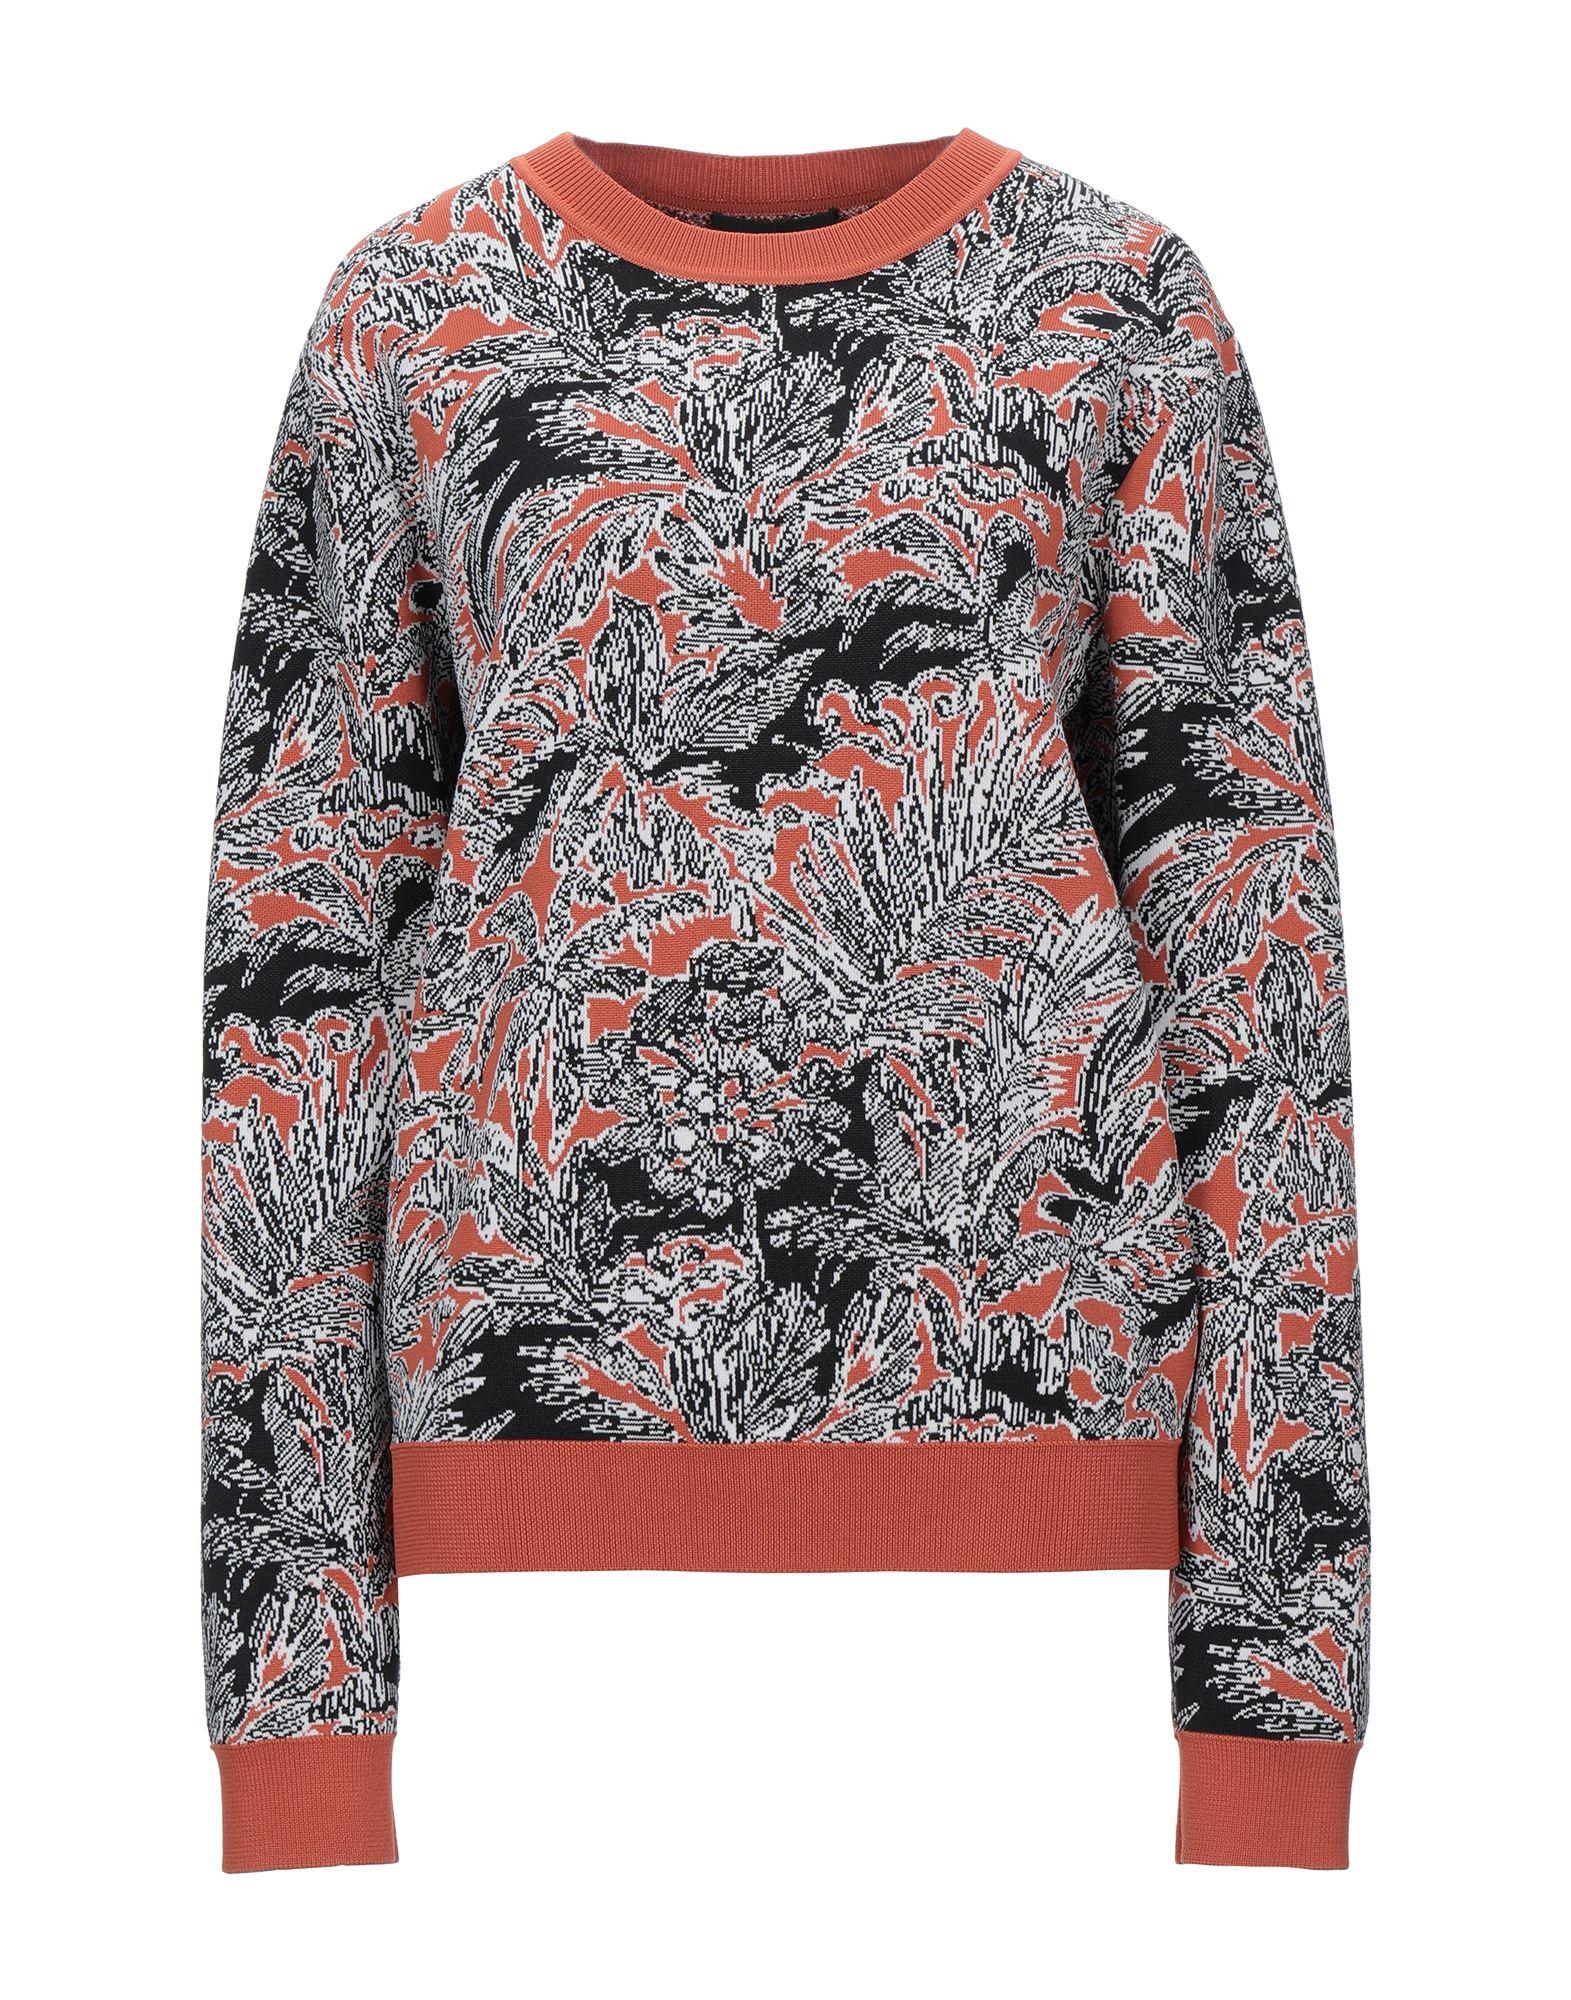 3.1 PHILLIP LIM Свитер 3 1 phillip lim свитер